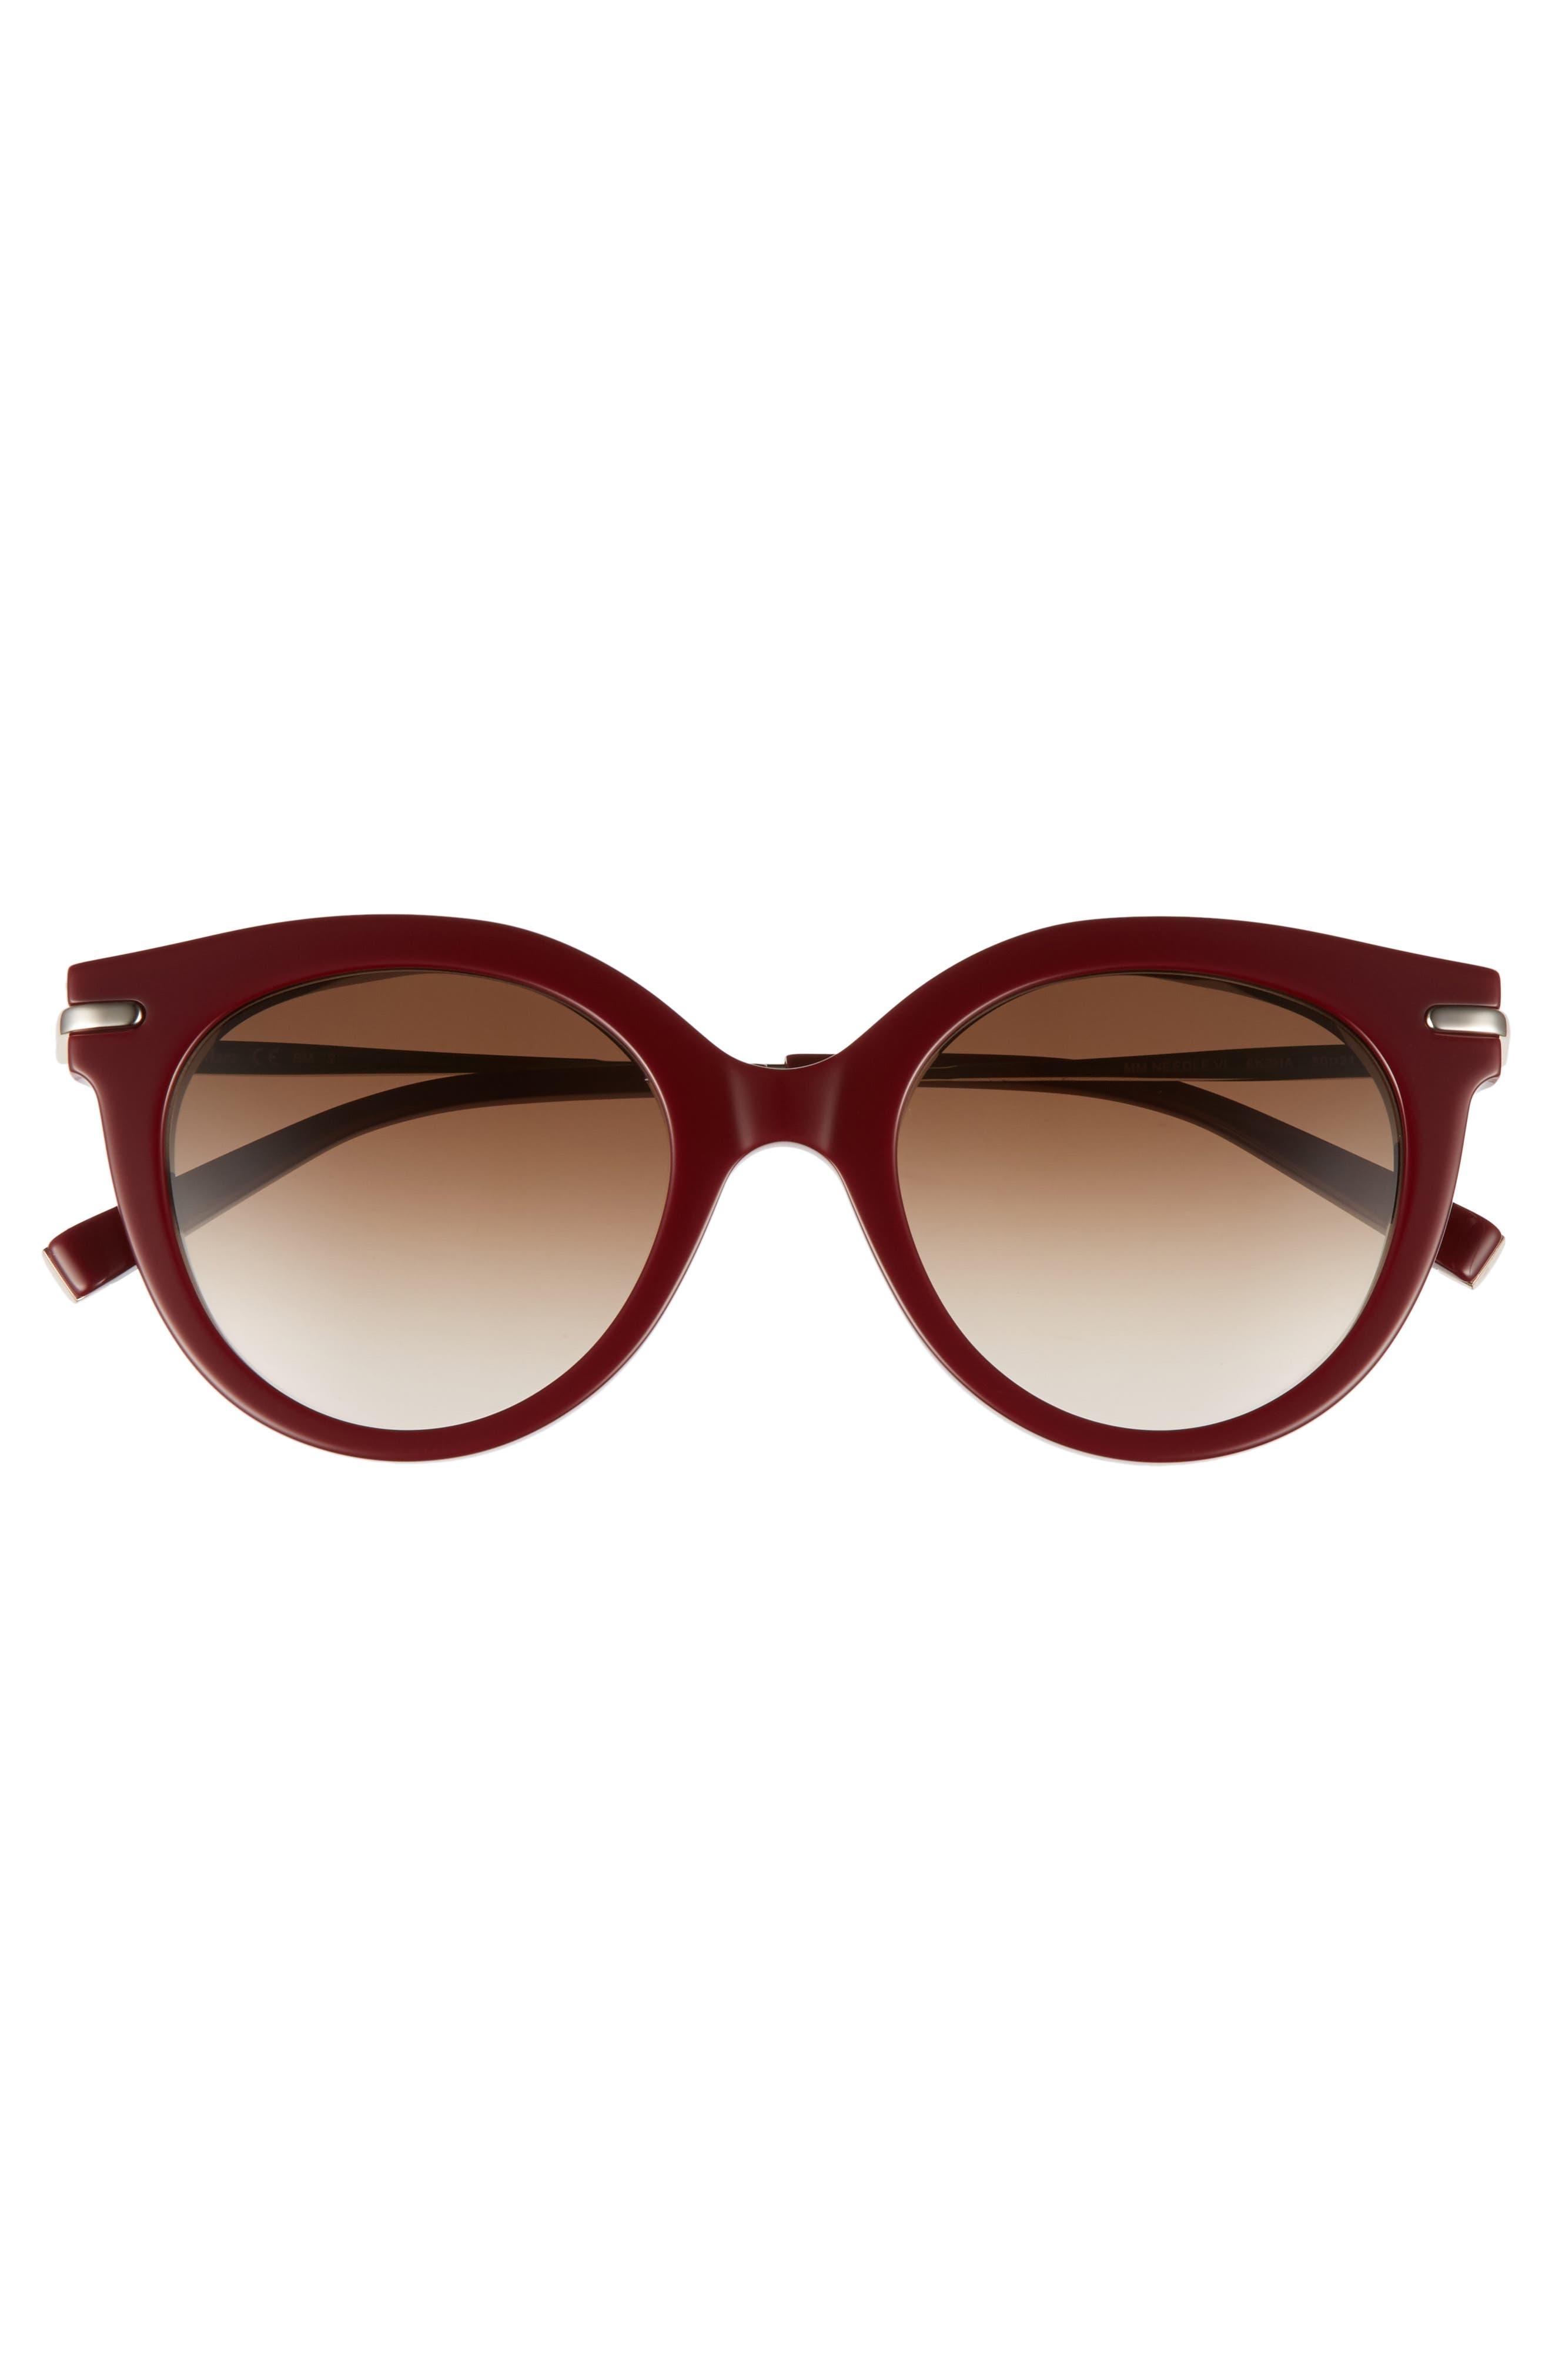 Needle VI 50mm Gradient Round Sunglasses,                             Alternate thumbnail 3, color,                             BURGUNDY GOLD